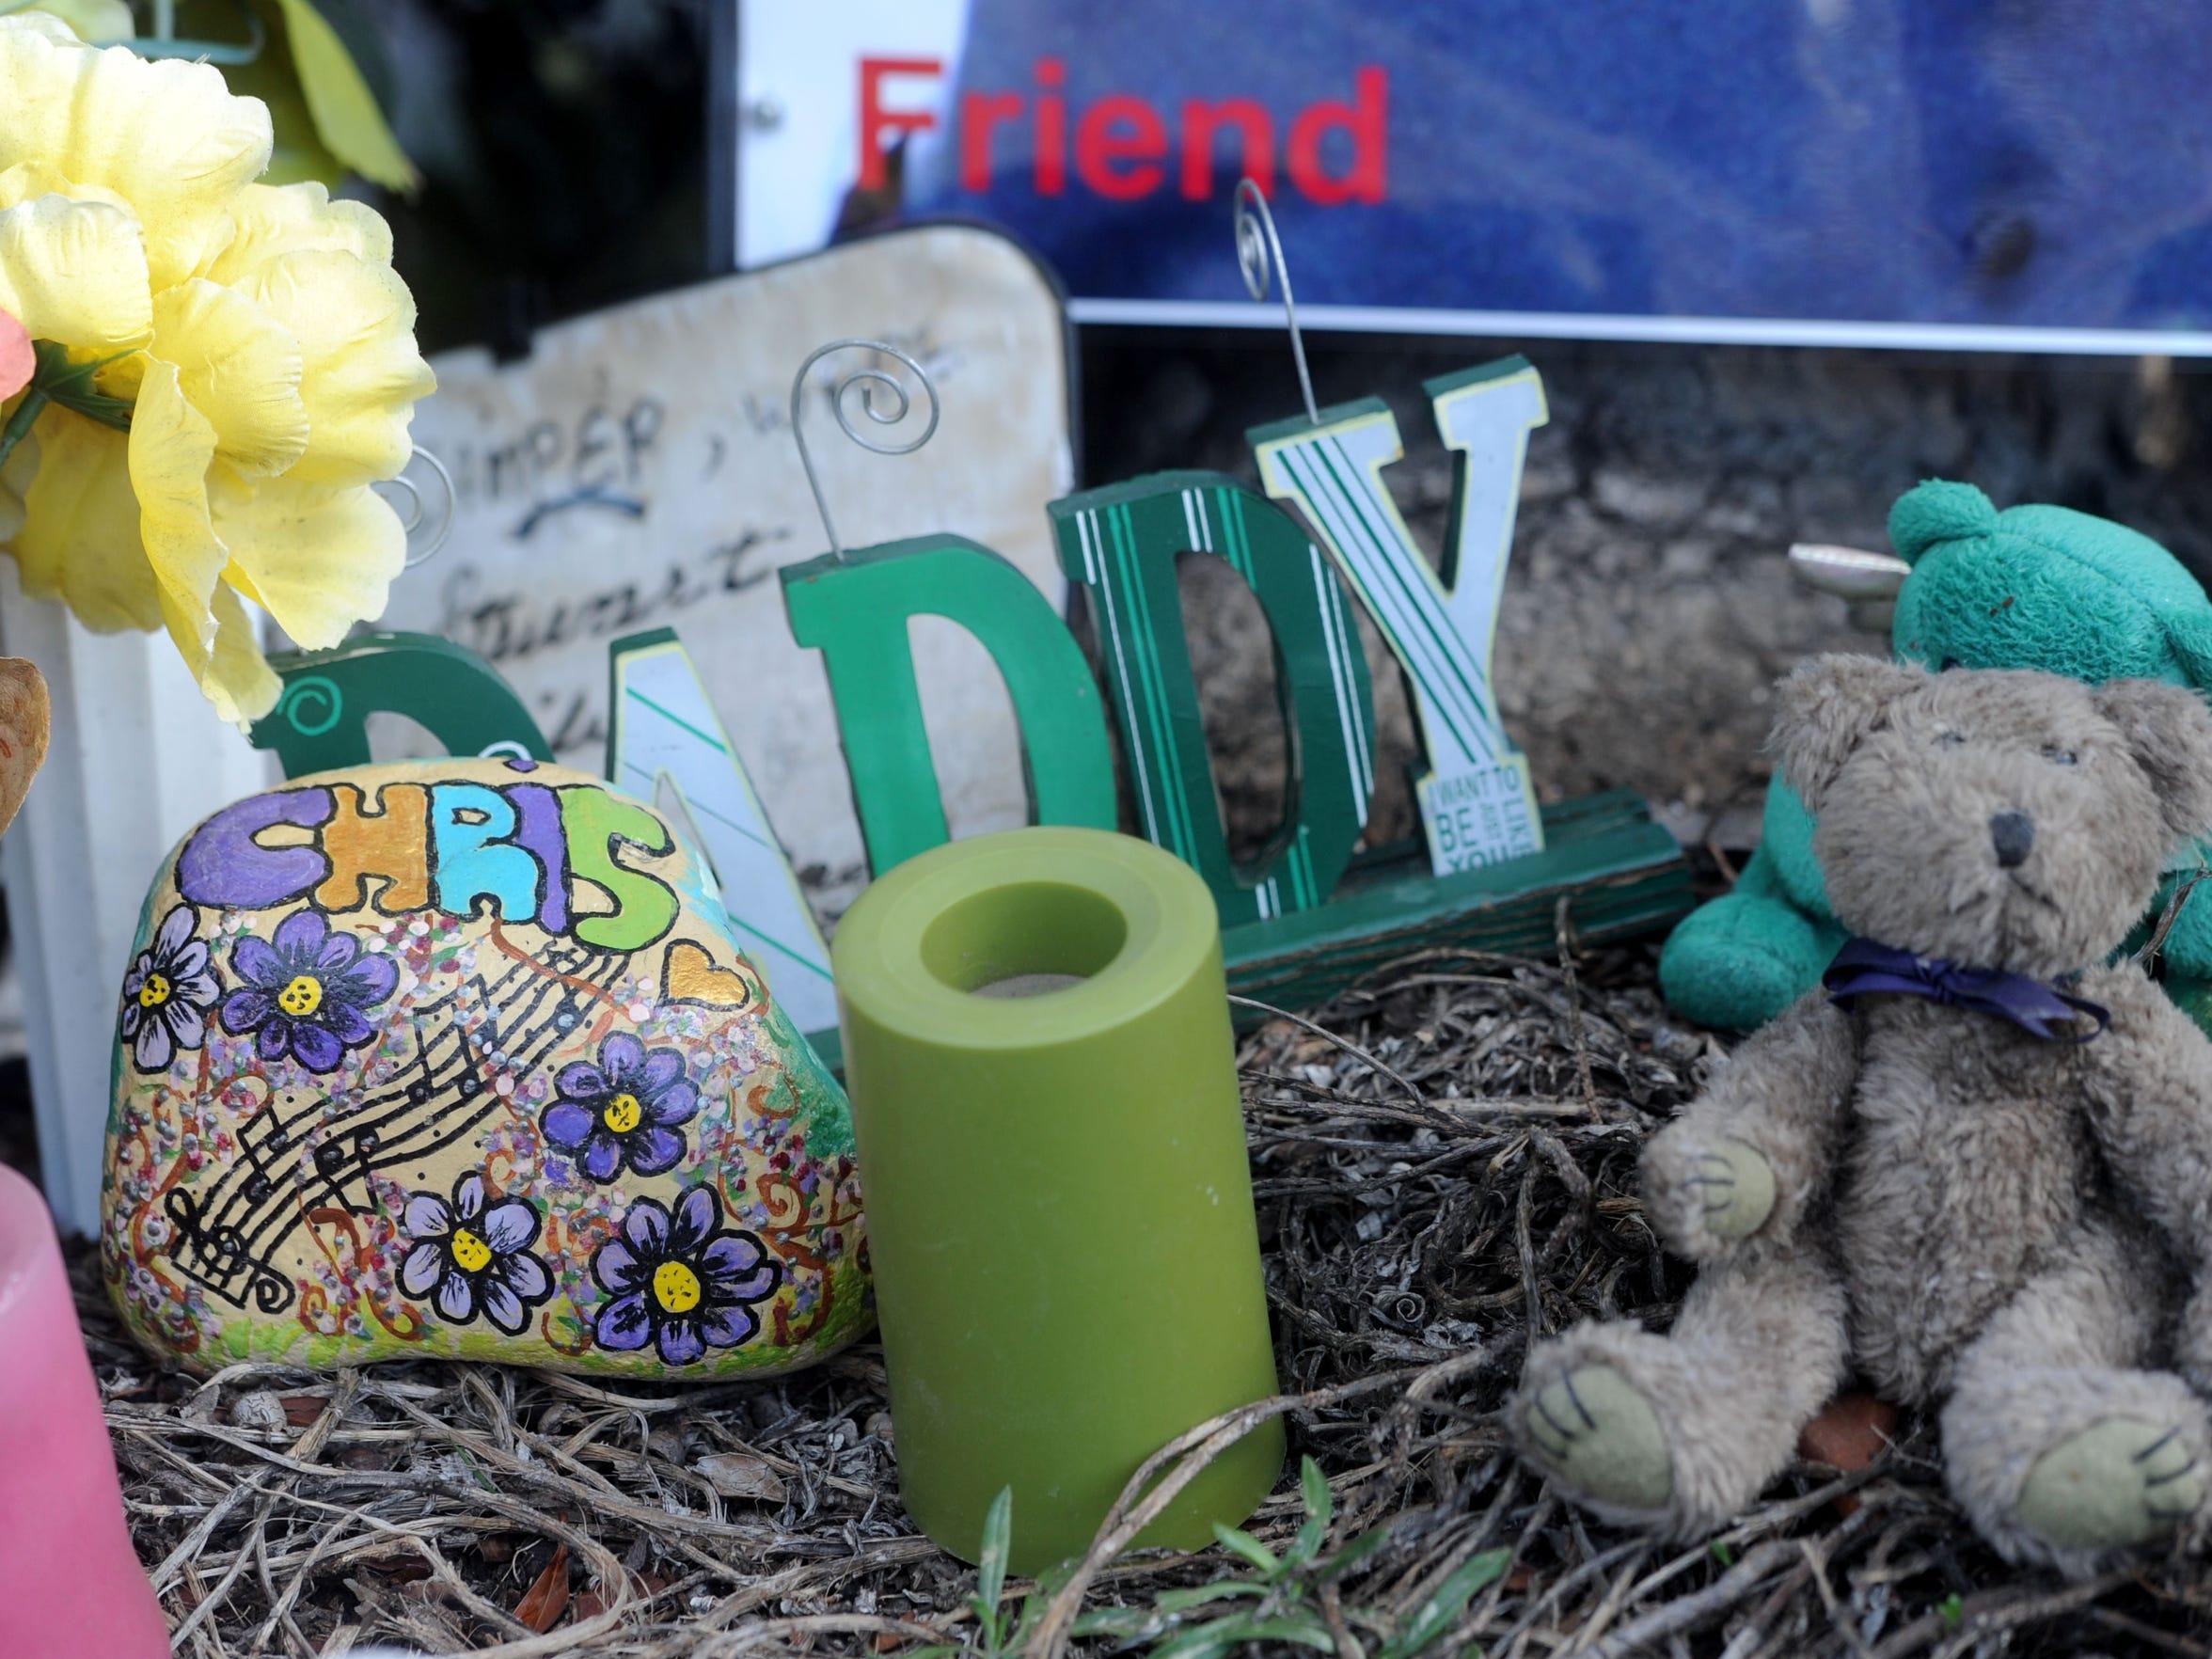 A memorial at a bus stop on North Ventura Road in Oxnard